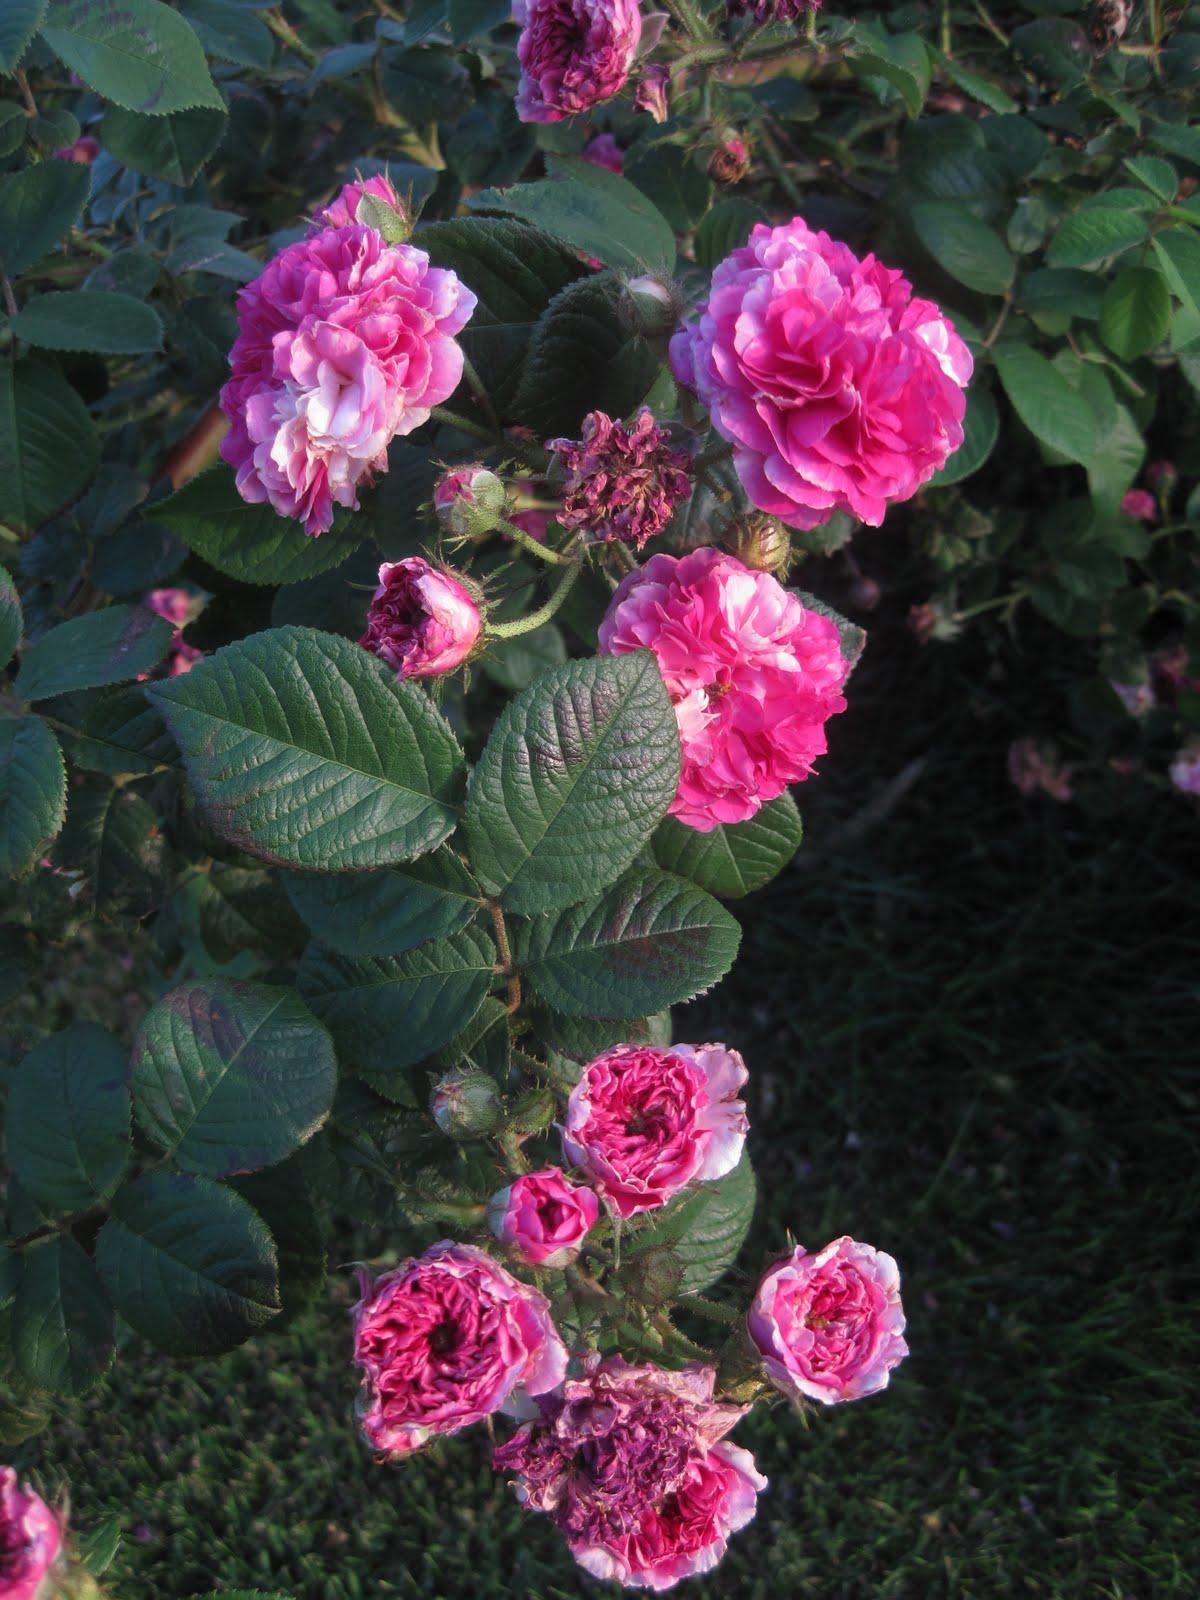 Shabby Pink World Antique Seven Sister S Rose Bush